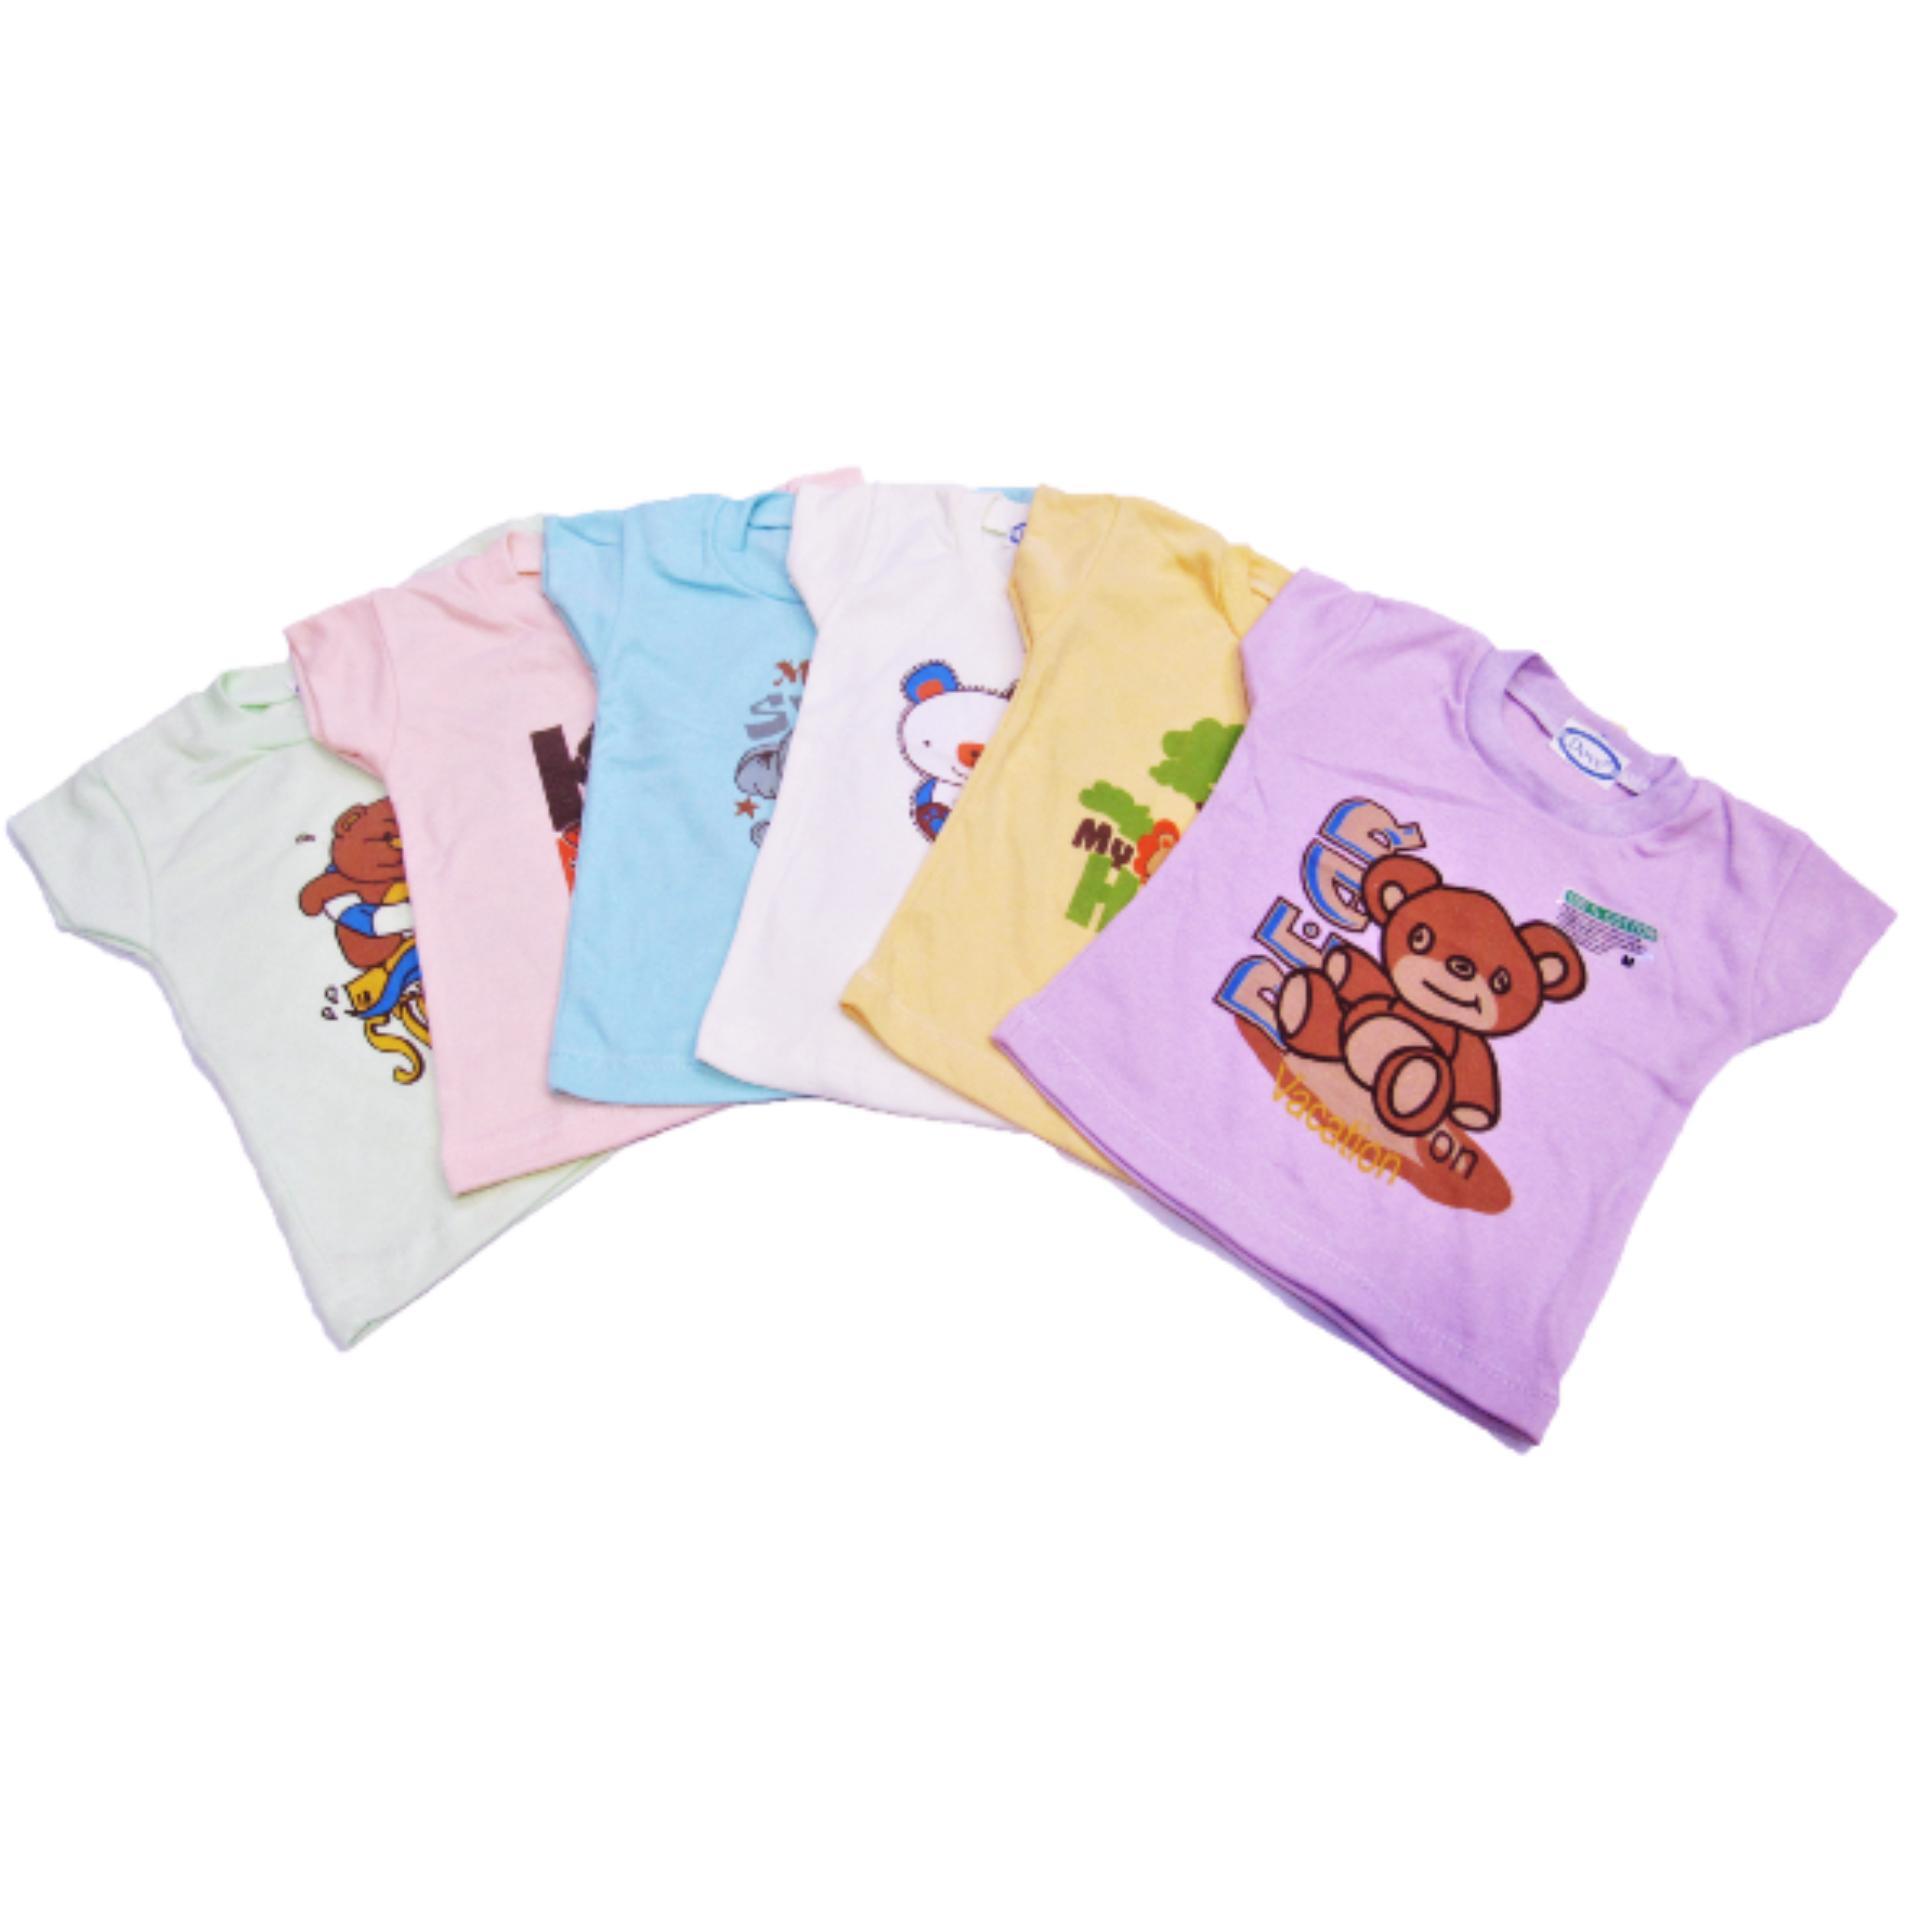 Wulanda 6 pcs baju bayi kaos oblong anak dove motif gambar multiwarna